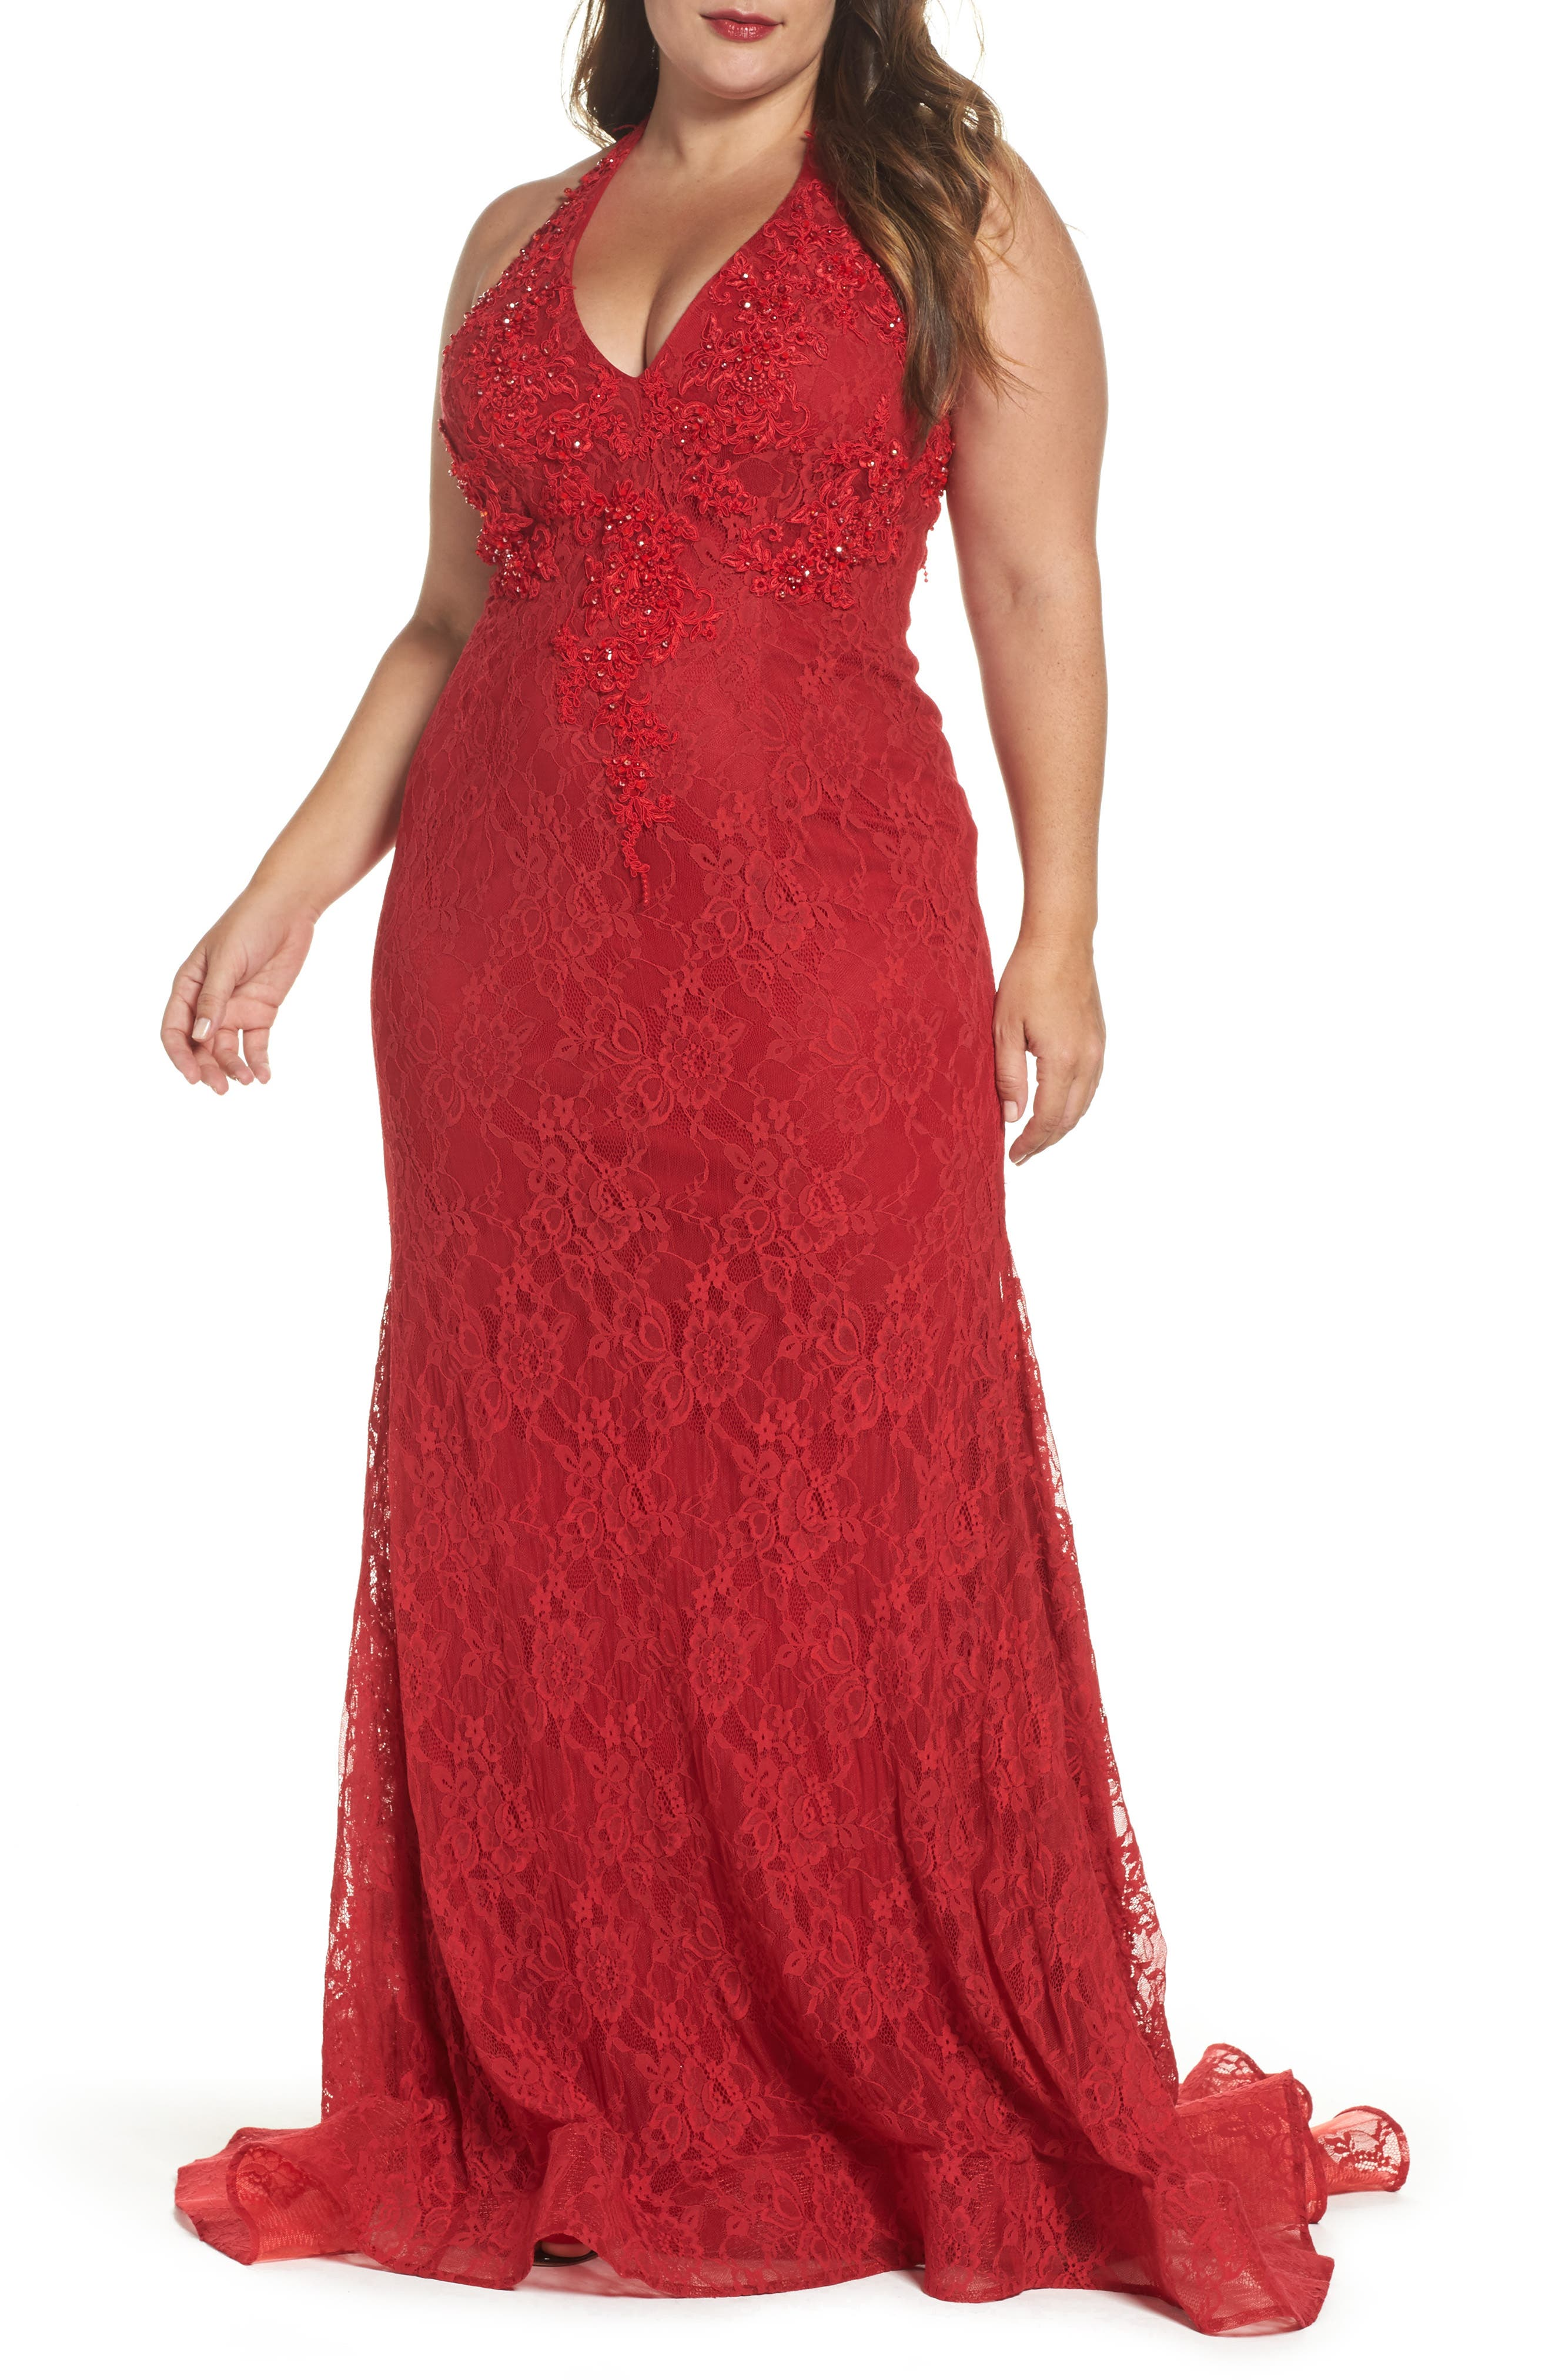 Main Image - MacDuggal Lace Halter Dress (Plus Size)